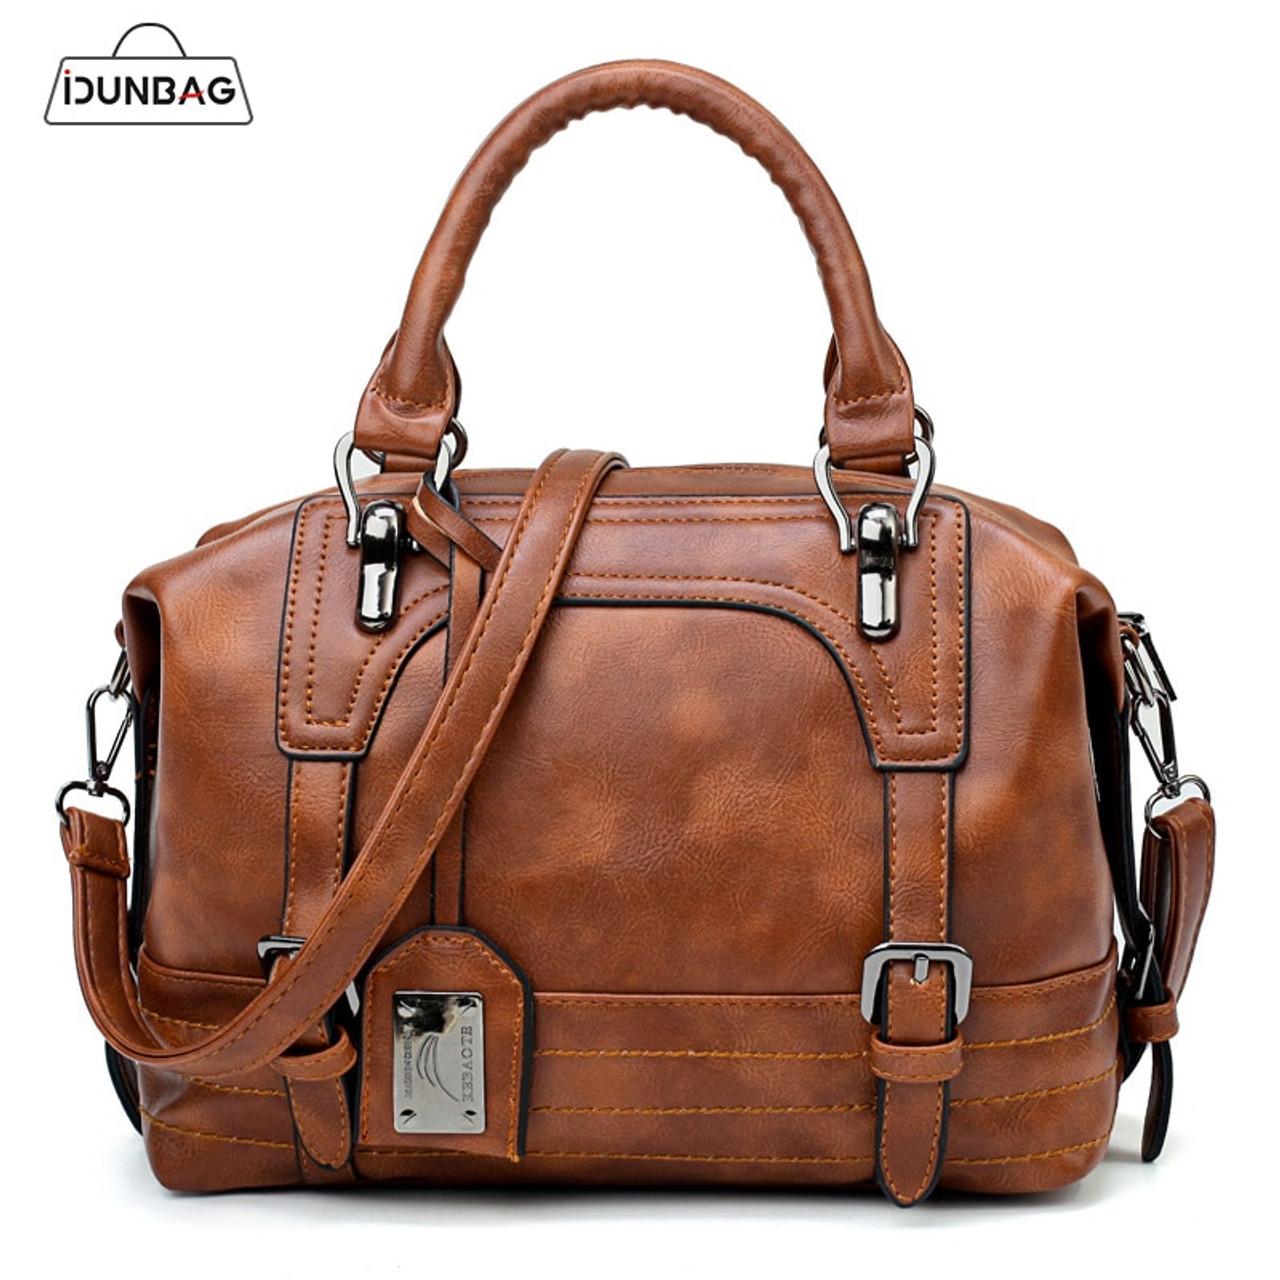 4a1f790d380 Brown Vintage Fashion Casual Tote Boston Bags Handbags Women Famous Brands  Luxury Pu Leather Women Bag Female Shoulder Bags 2018